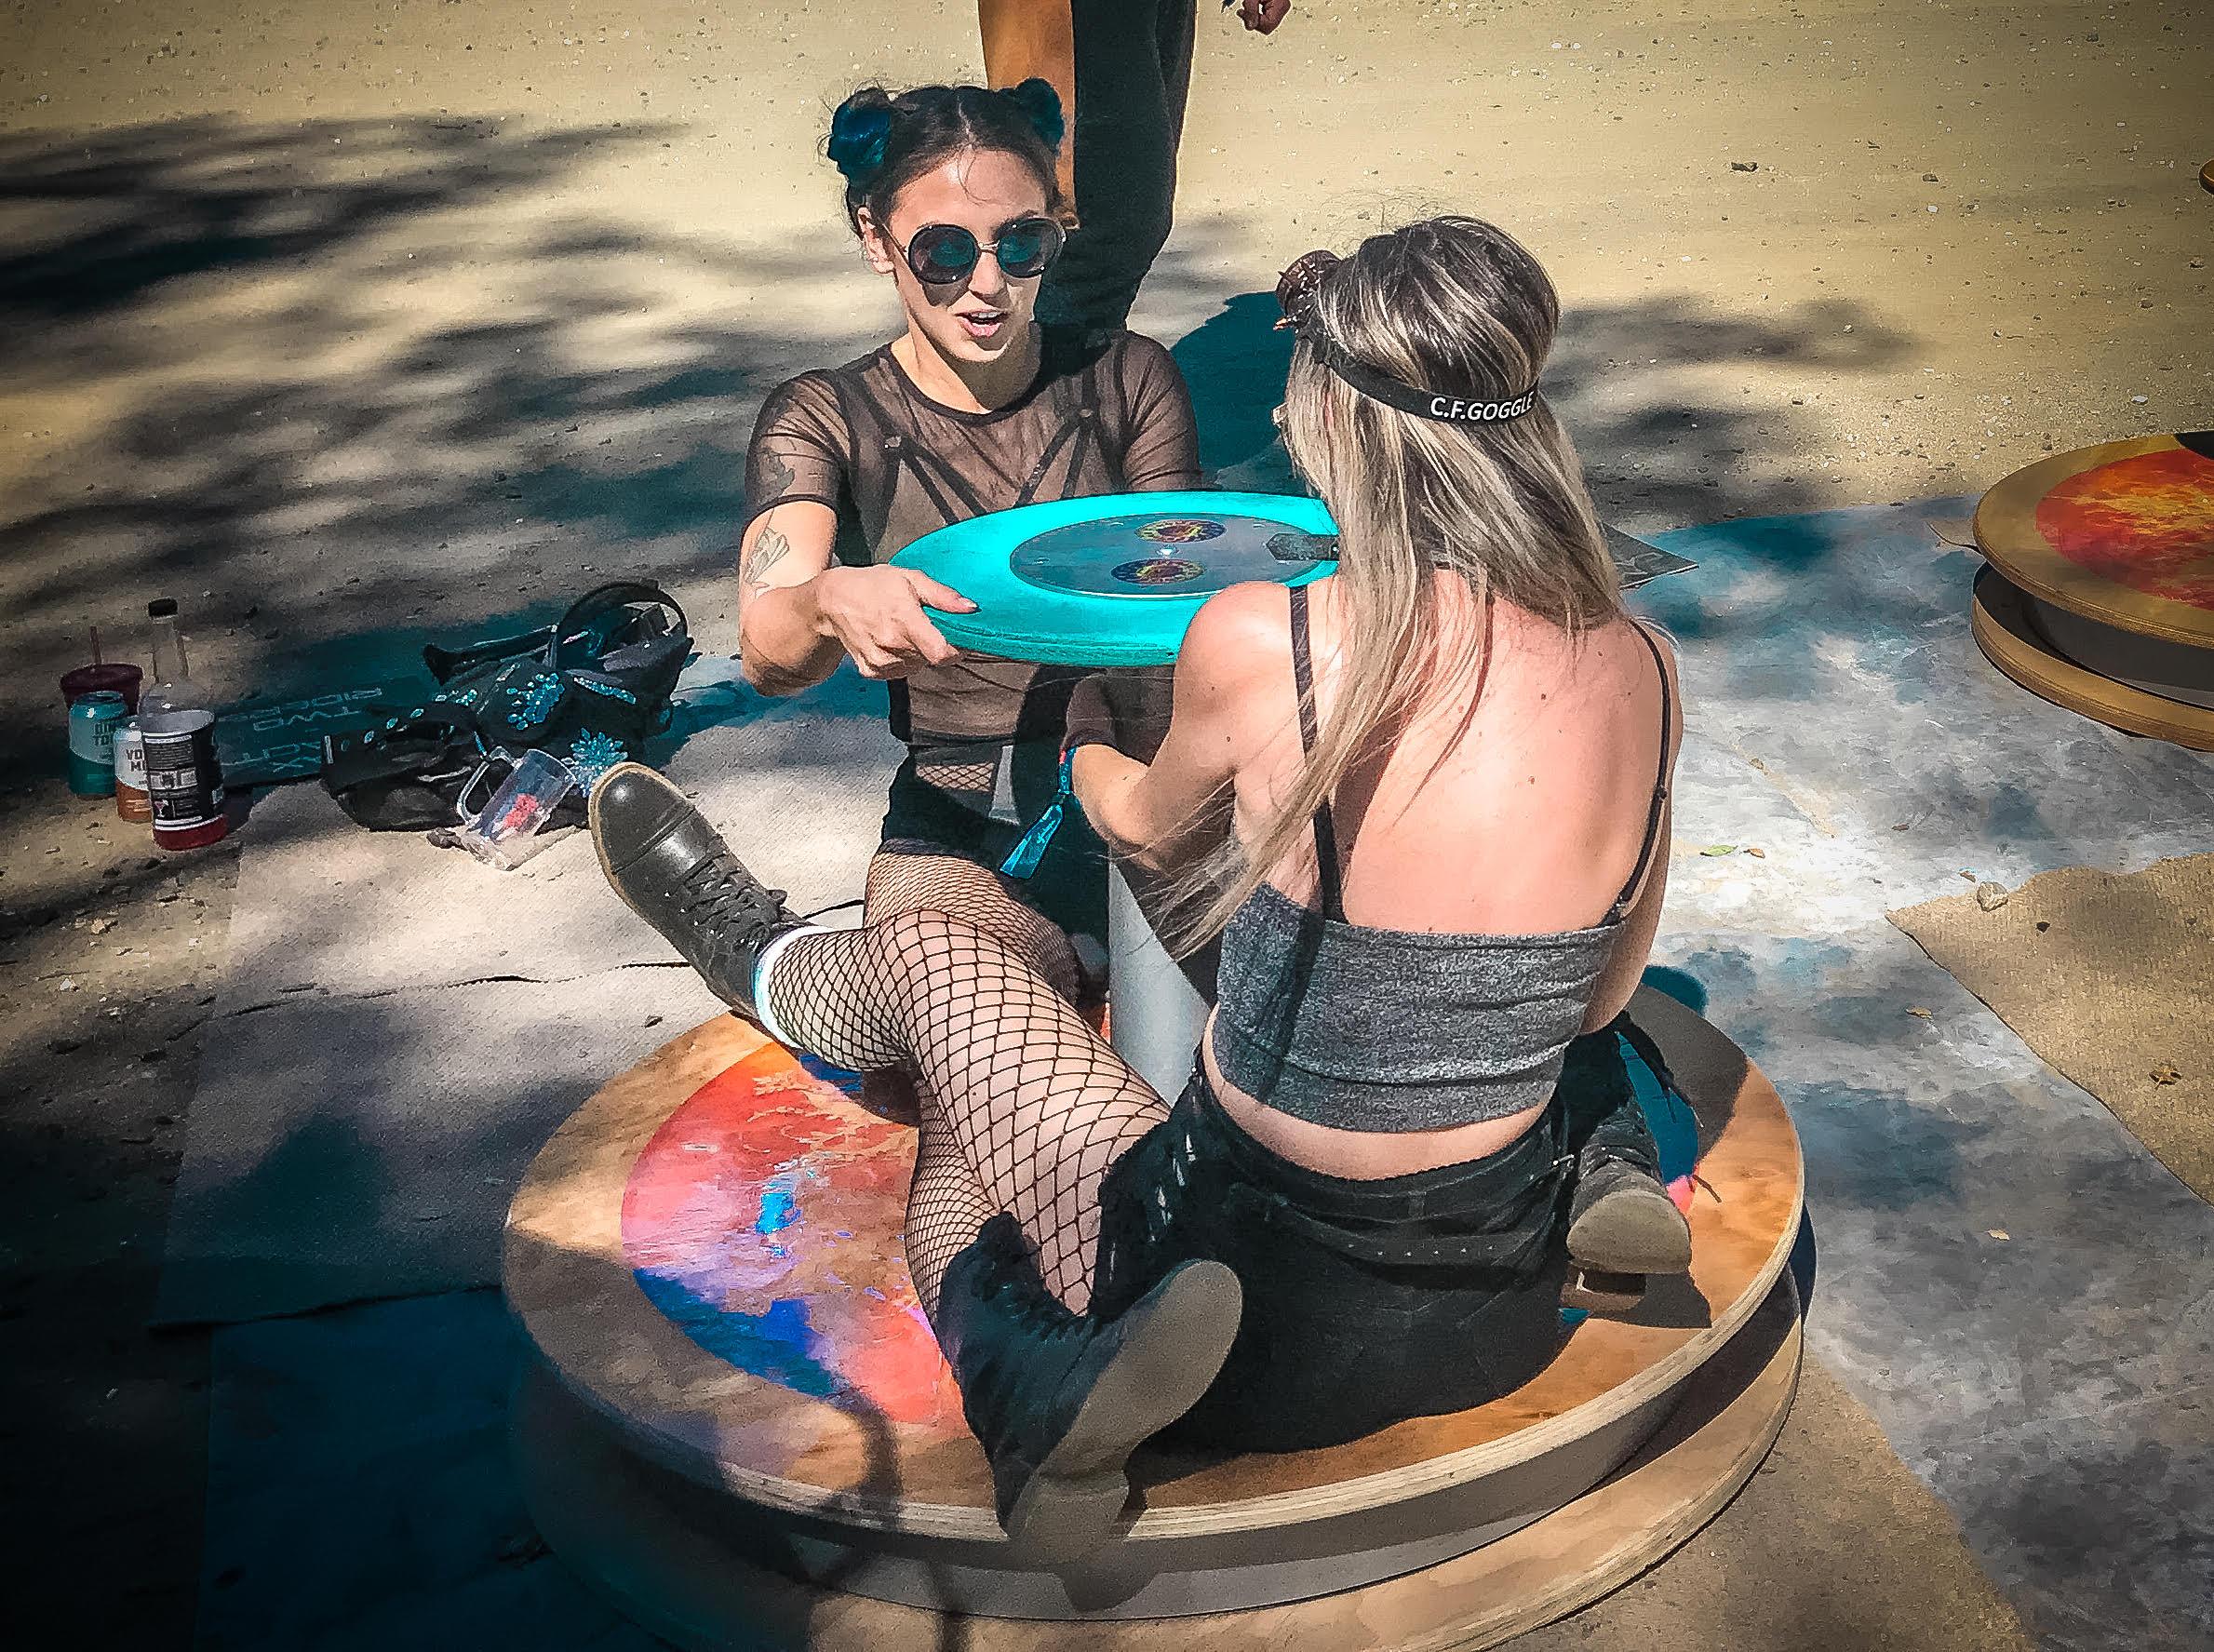 Girls riding youtopia.jpg